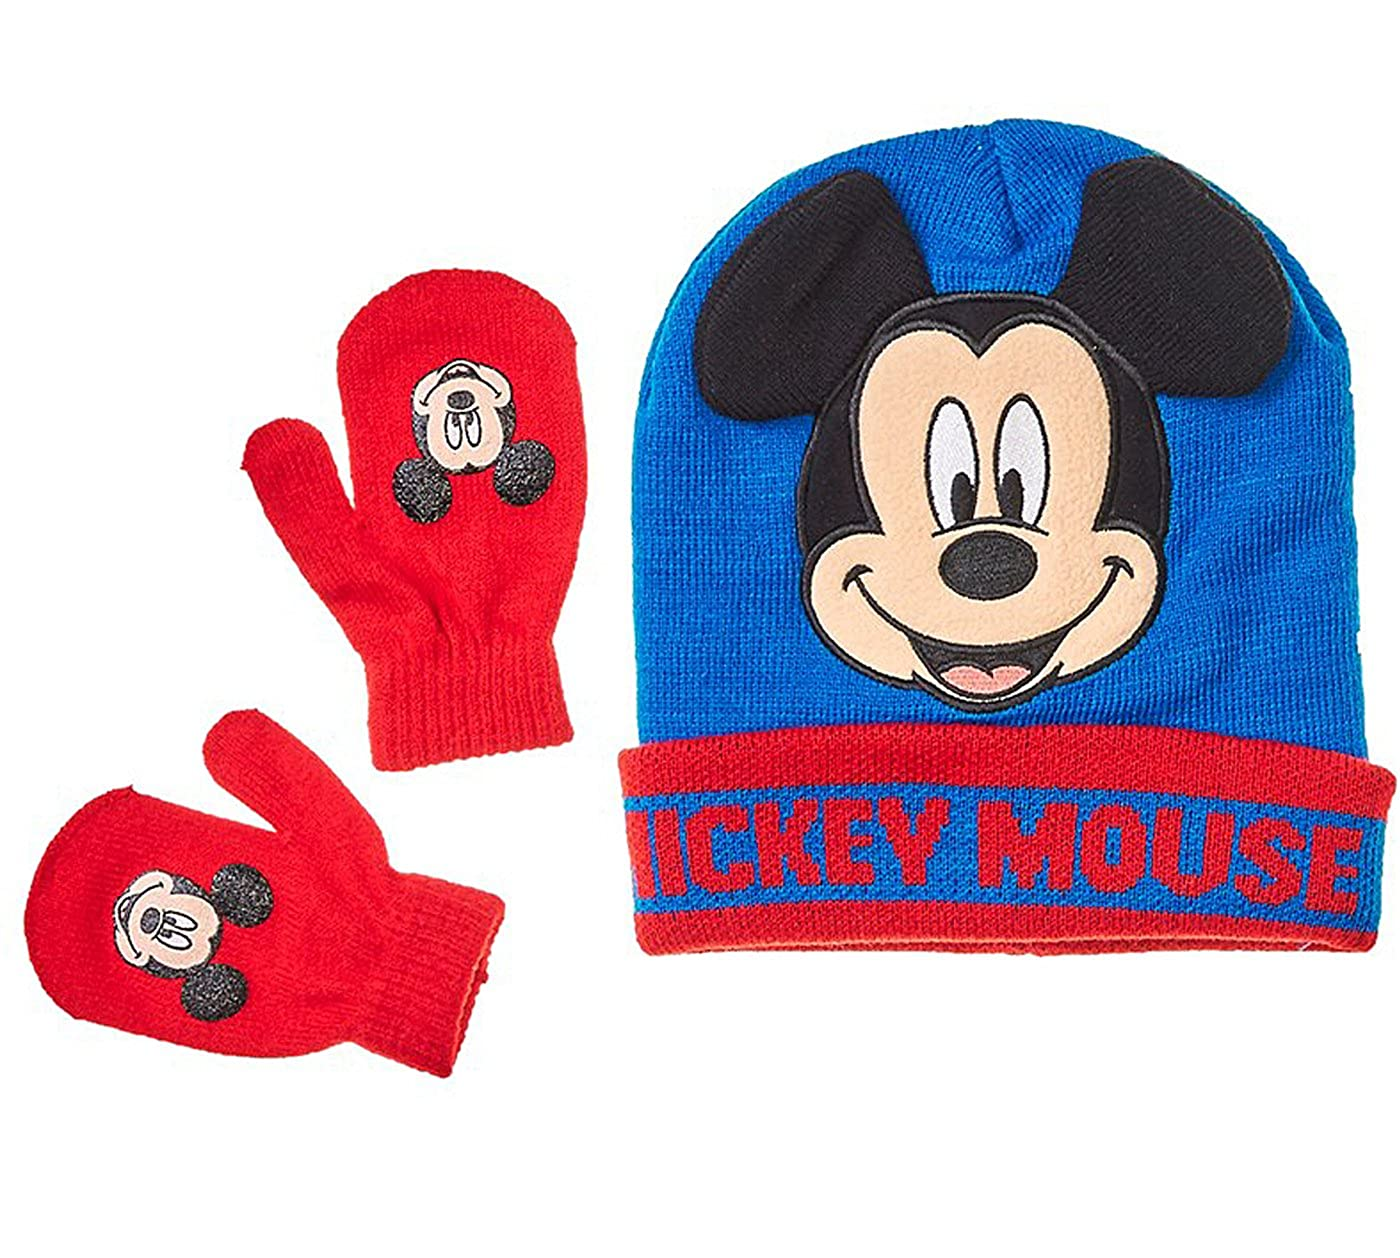 Mickey Mouse Little Toddler Boys Winter Hat /& Mitten Set